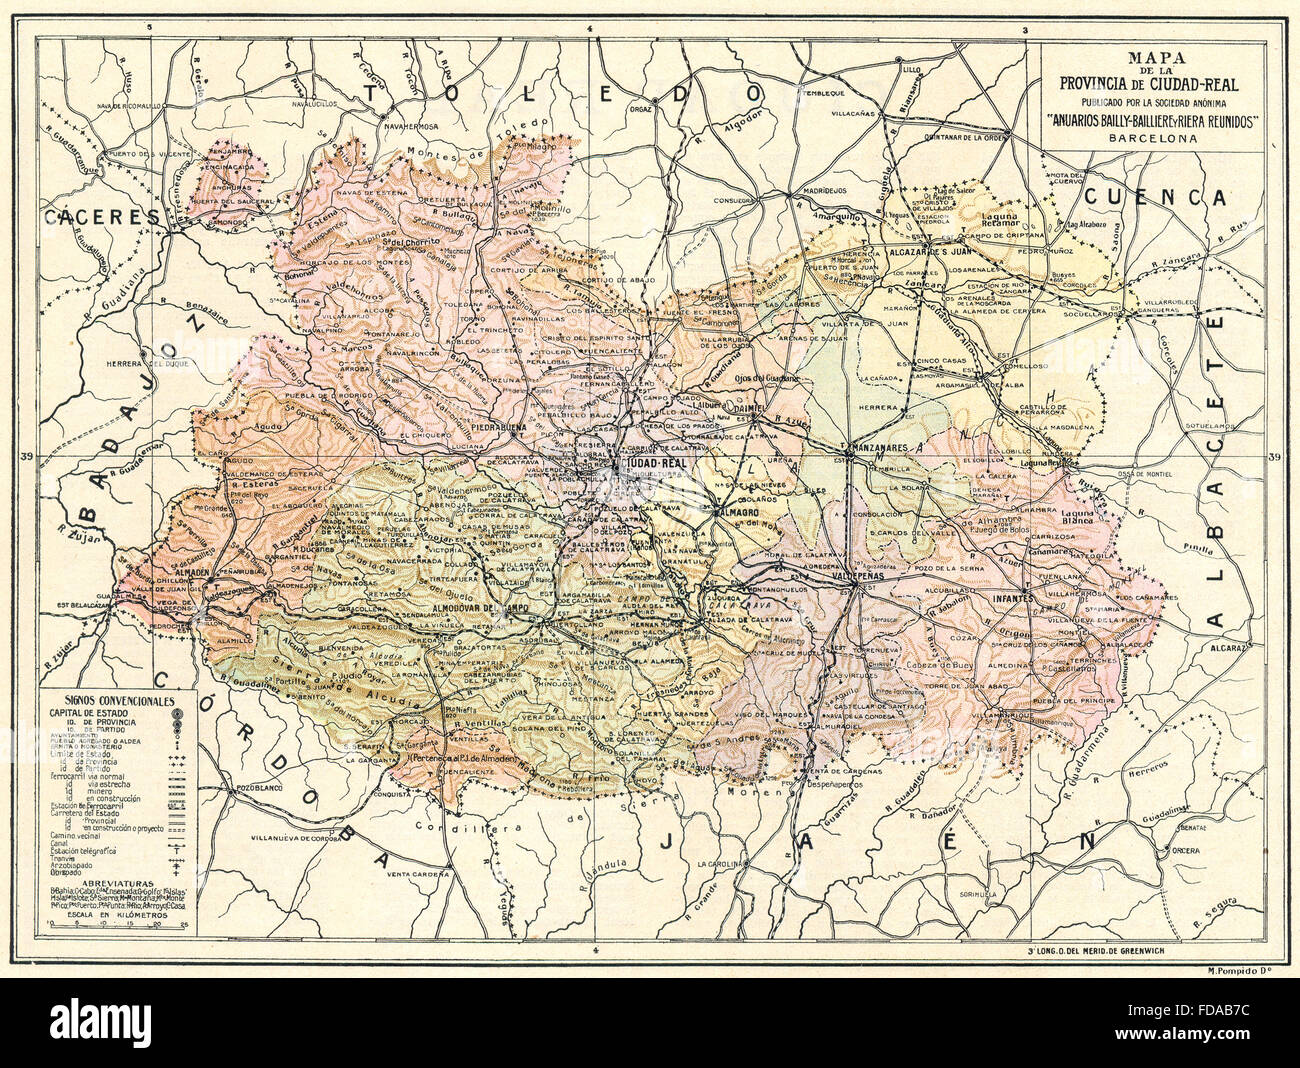 Mapa Provincia Ciudad Real.Spain Mapa De La Provincia De Ciudad Real 1913 Stock Photo